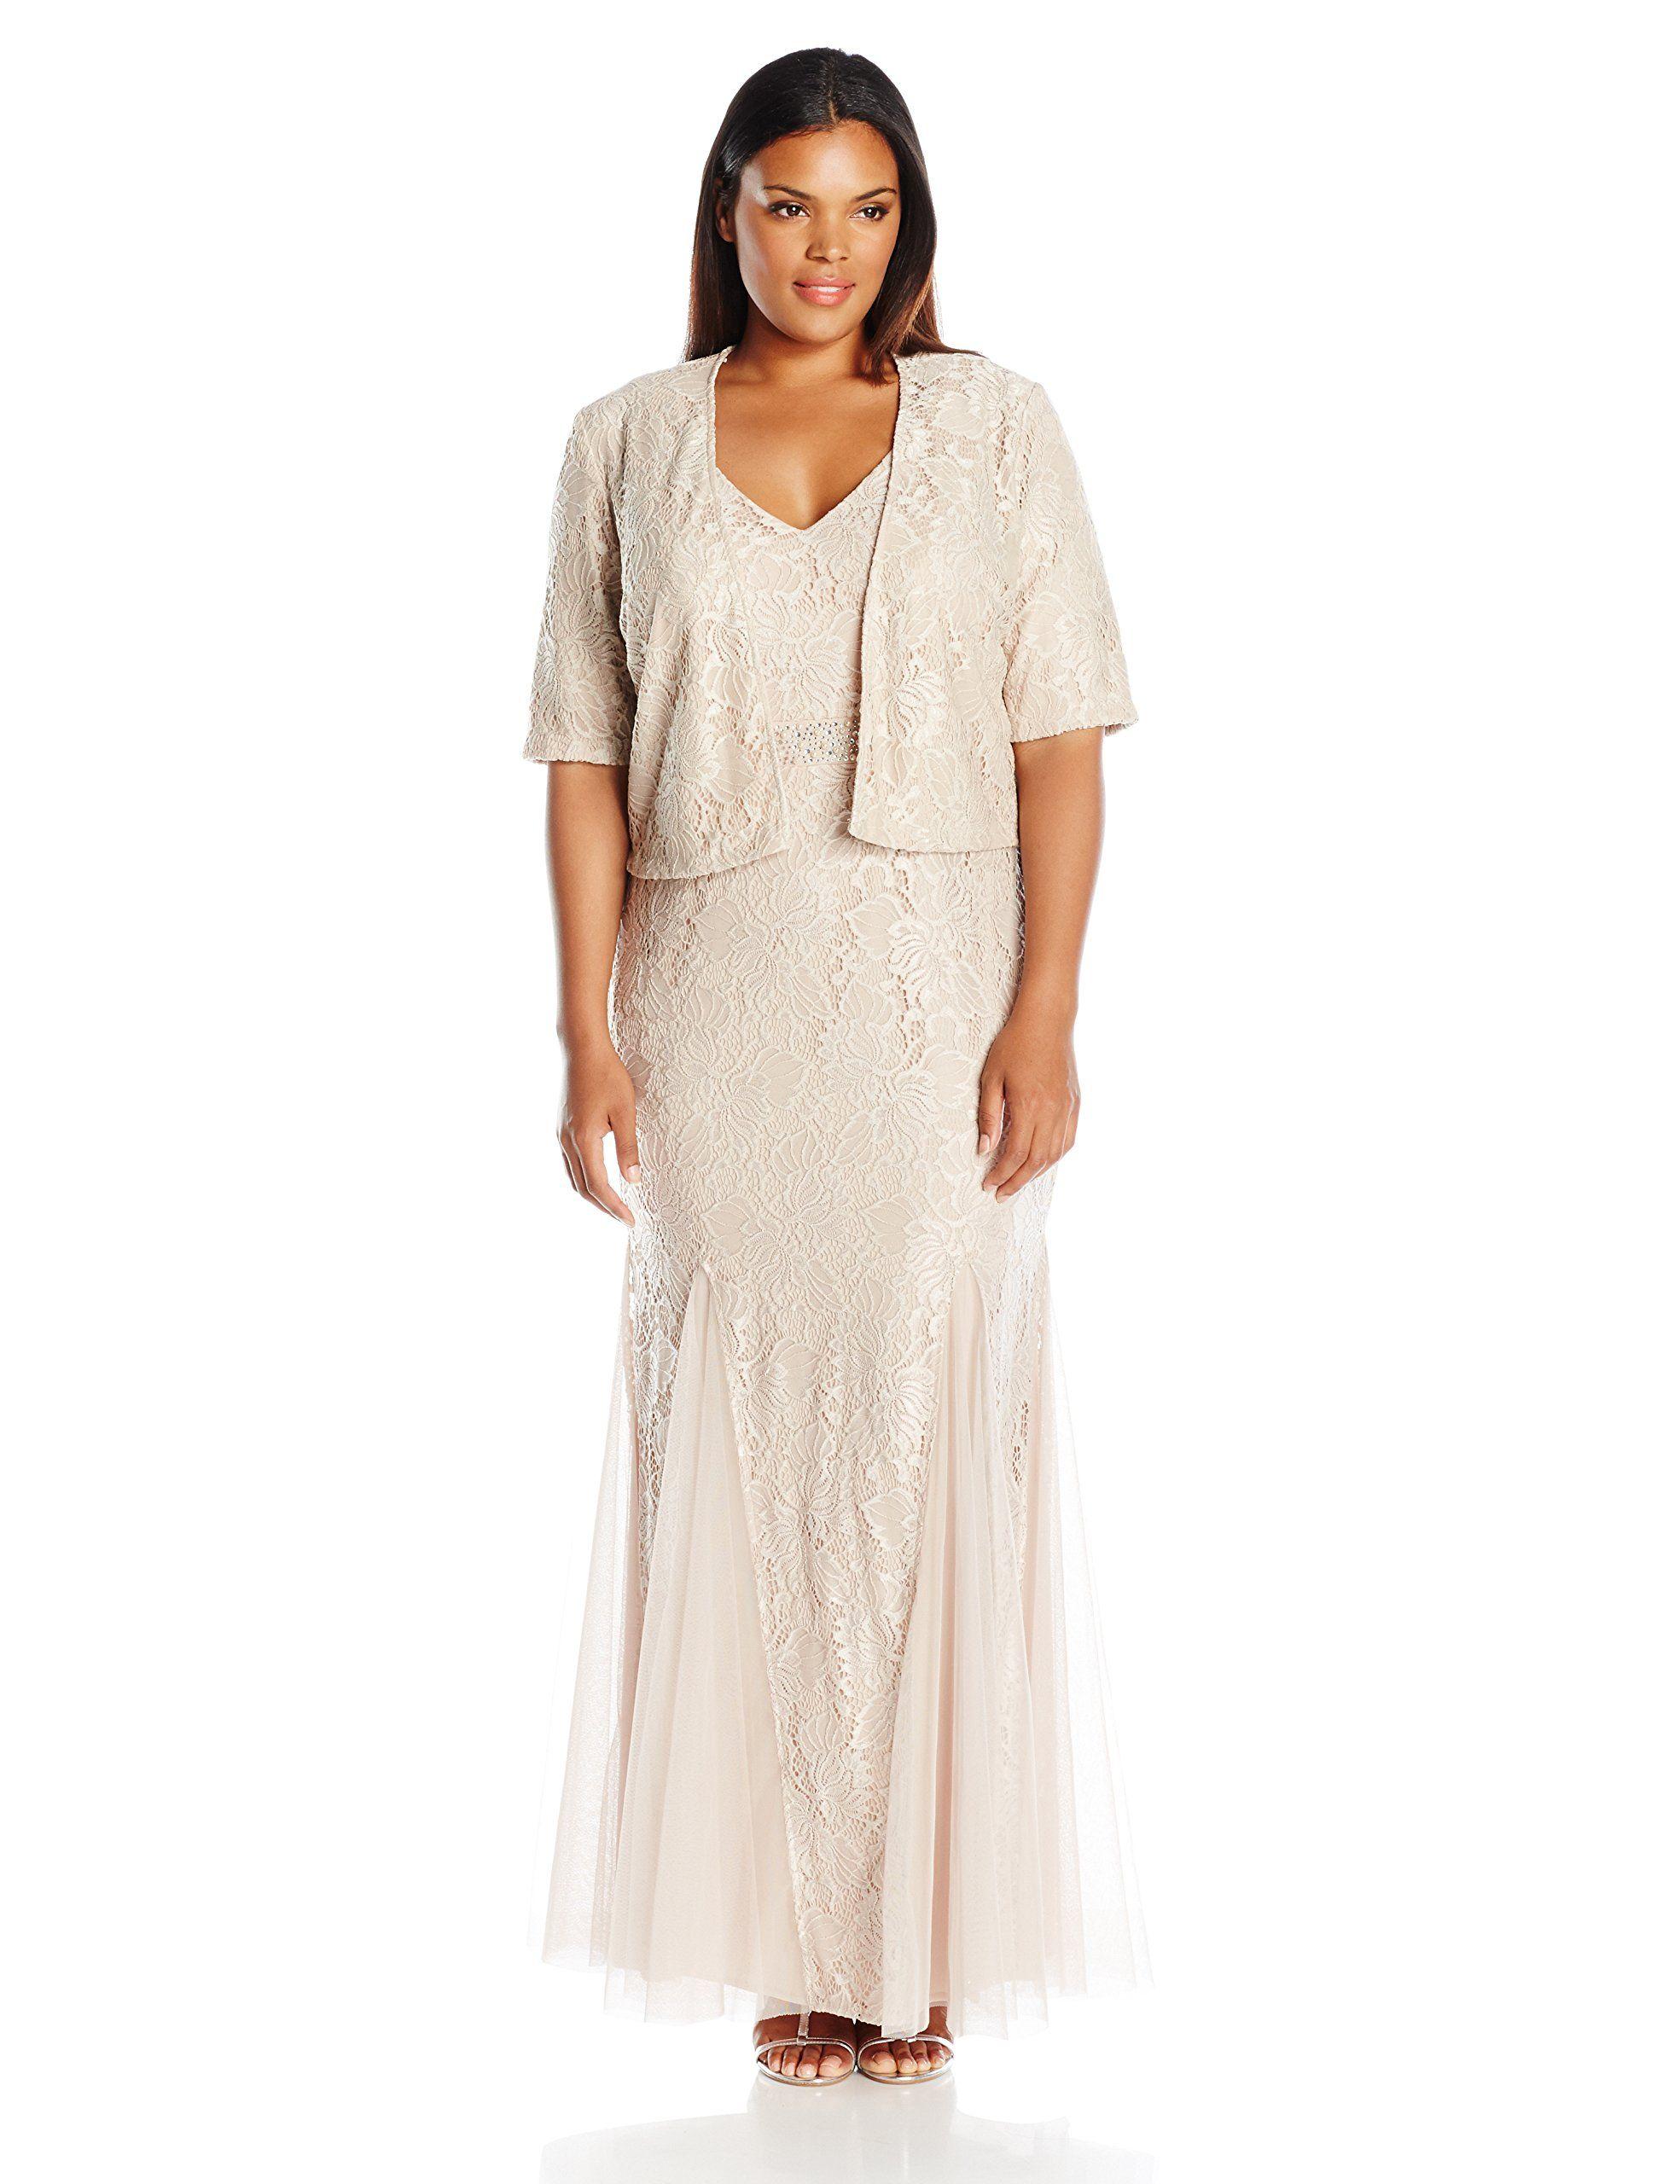 Alex evenings womenus plus size long lace jacket dress with